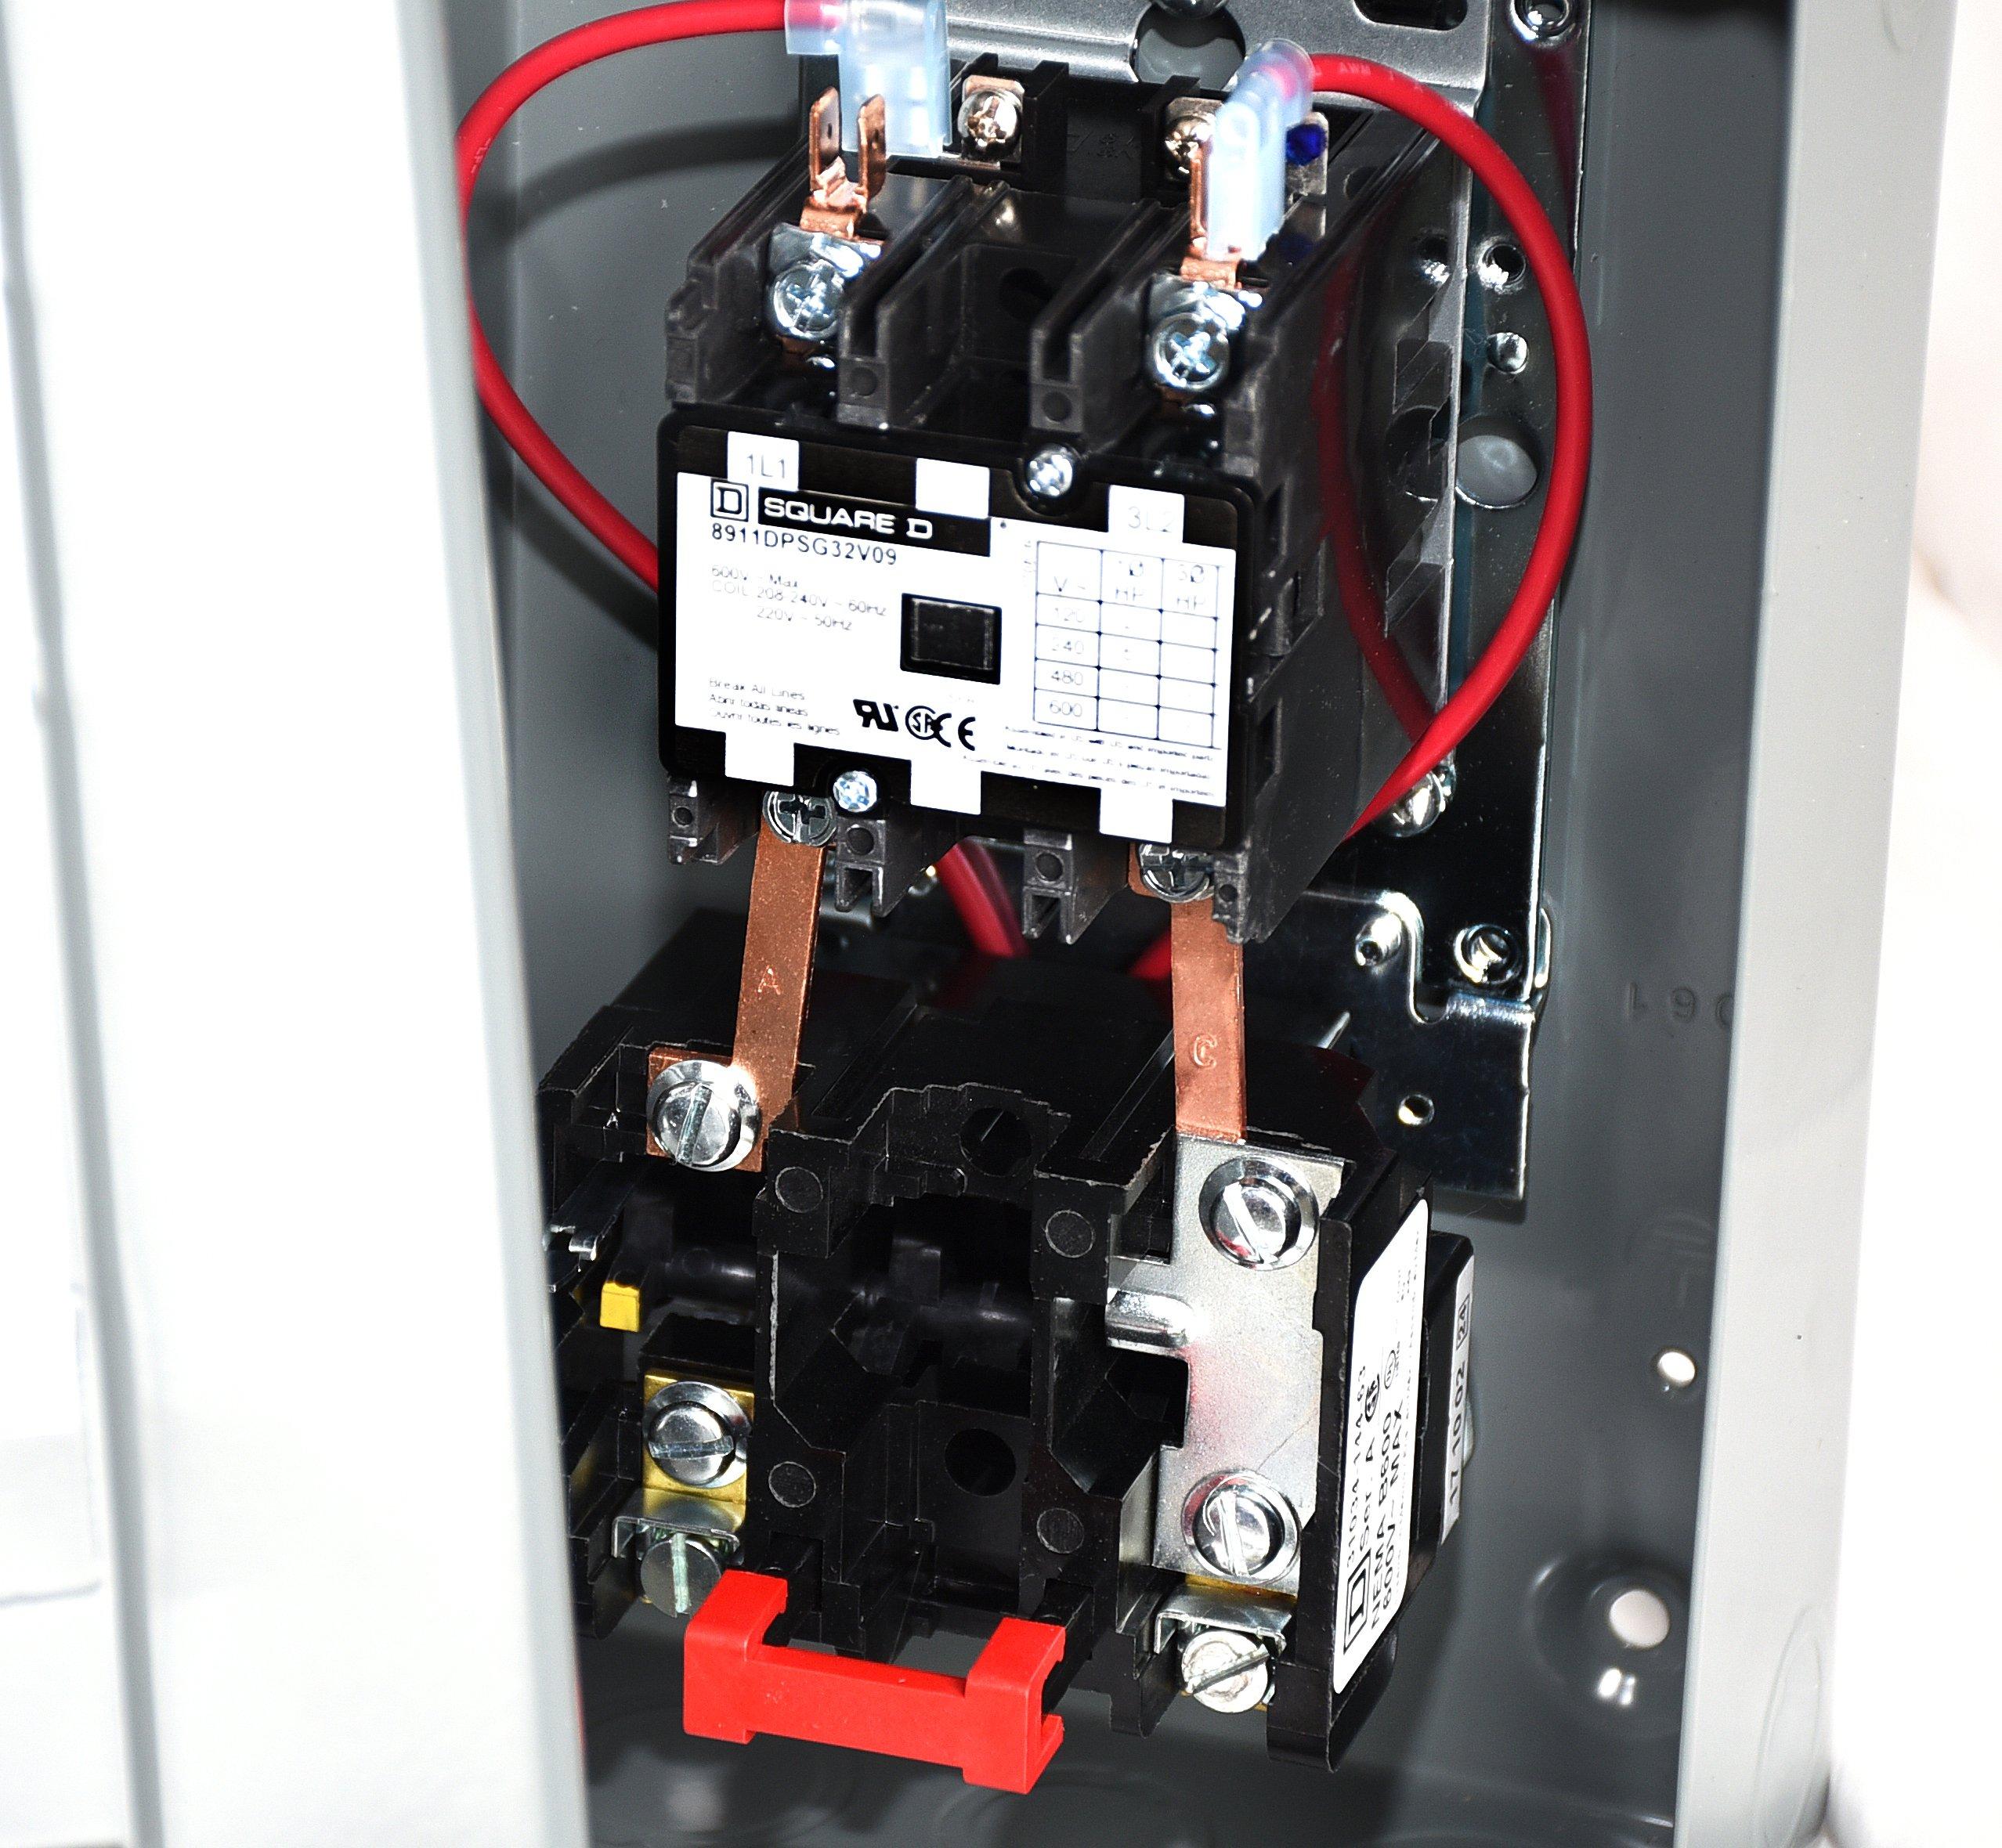 SQUARE D MAGNETIC STARTER CONRTROL ELECTRIC MOTOR 8911DPSG42V09 7.5HP 1-PH 230V by I.E.E (Image #3)